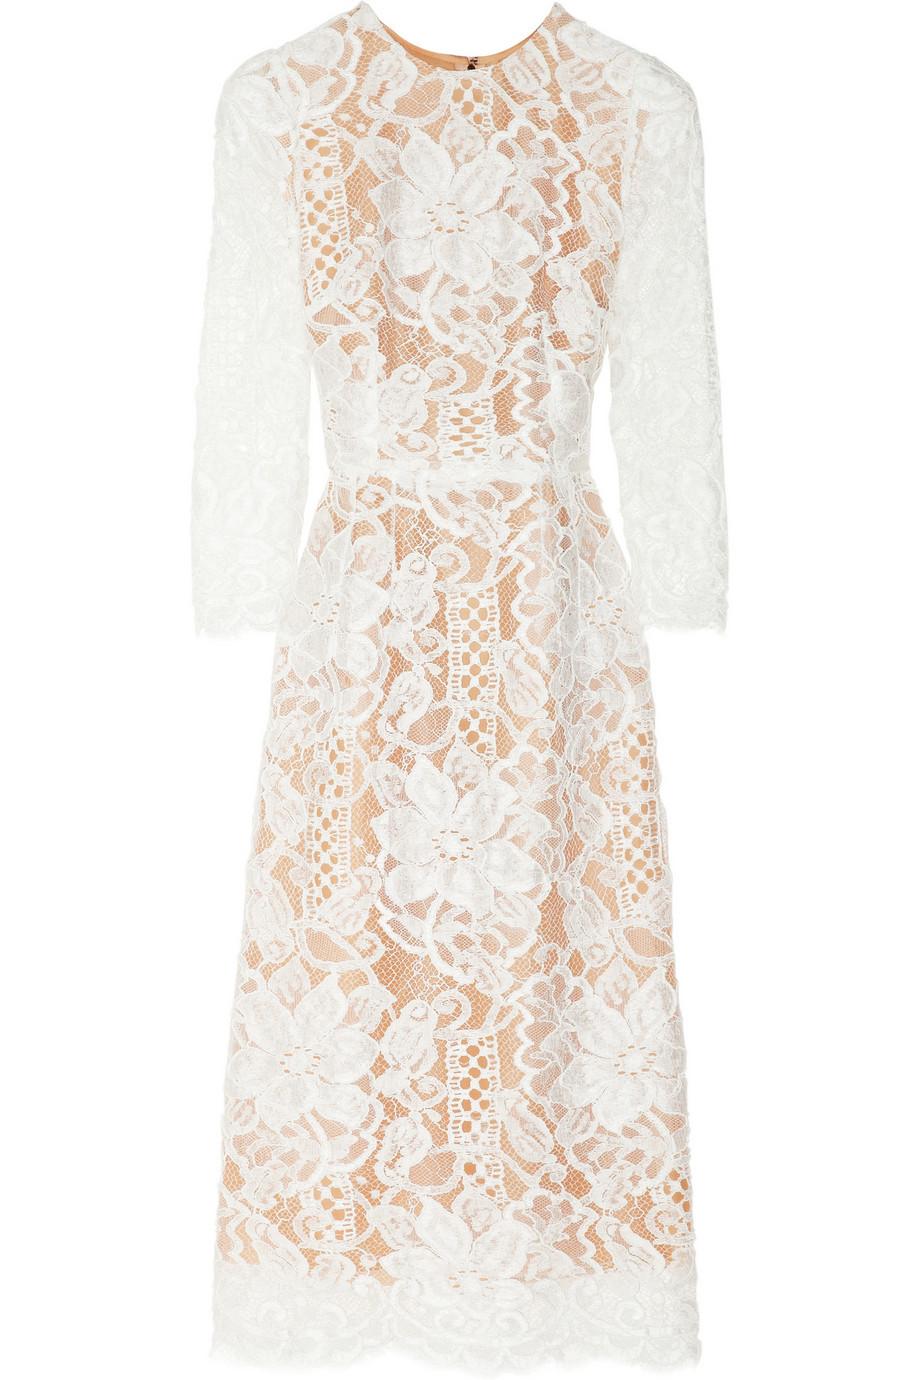 Lyst  Dolce  Gabbana Lace and Silkorganza Midi Dress in